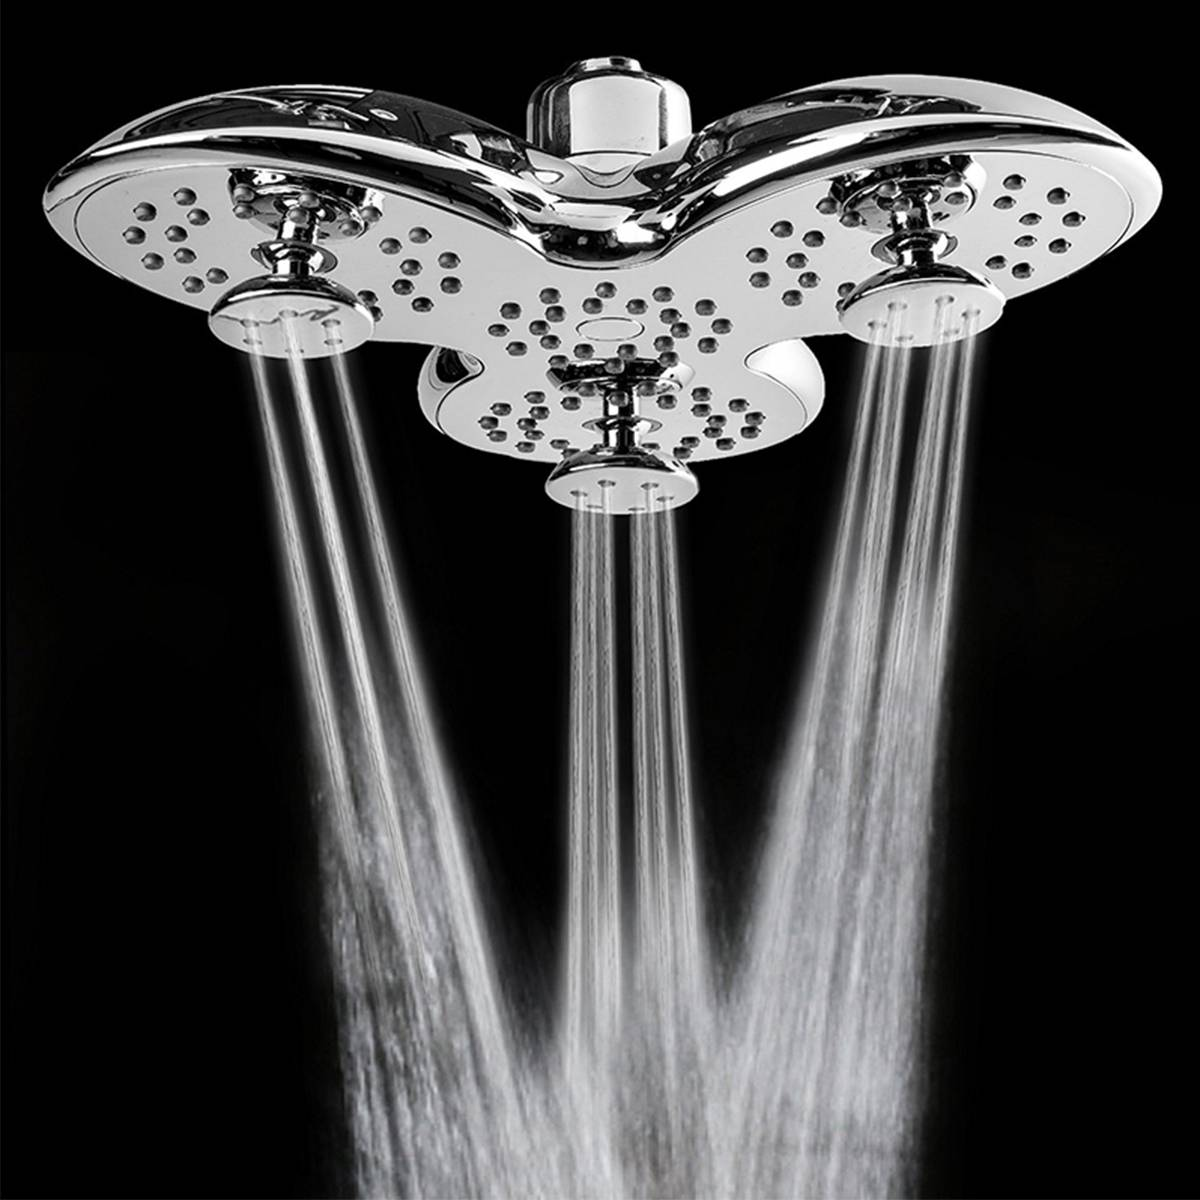 Bathroom Top Shower Head Petal Shape 3 Functions Modes Pressure Nozzle Rainfall Jetting Spa Abs Chrome Adjustable